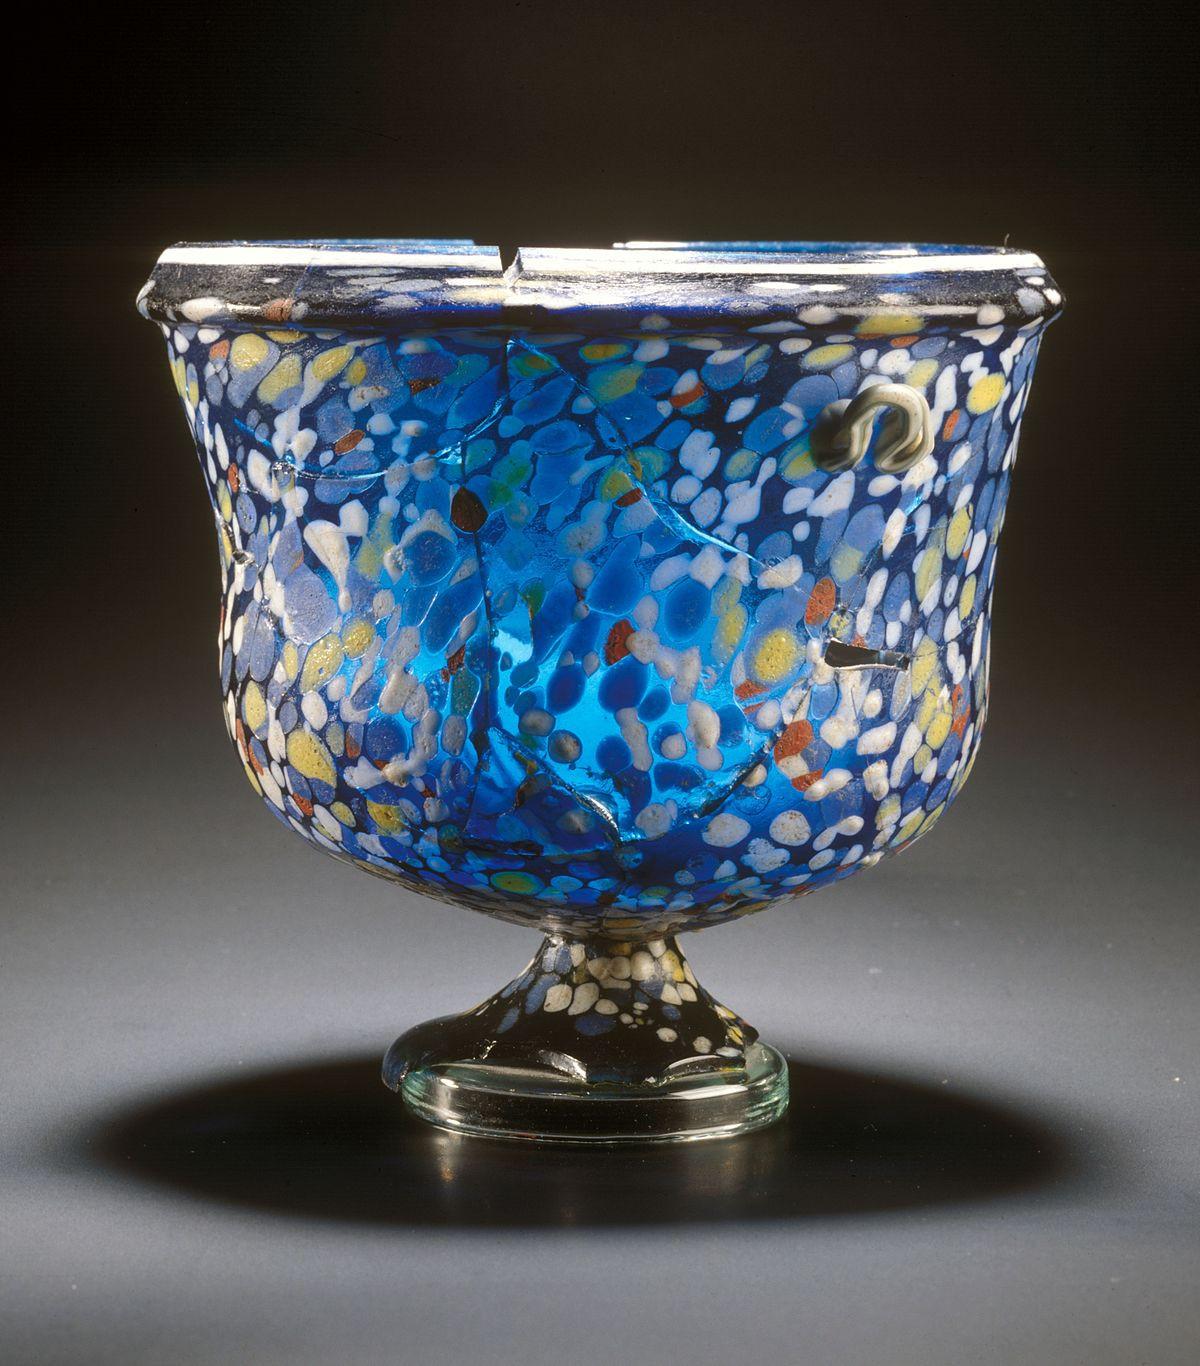 4 feet tall glass vases of glass art wikipedia intended for 1200px emona trgovina in obrt 1a